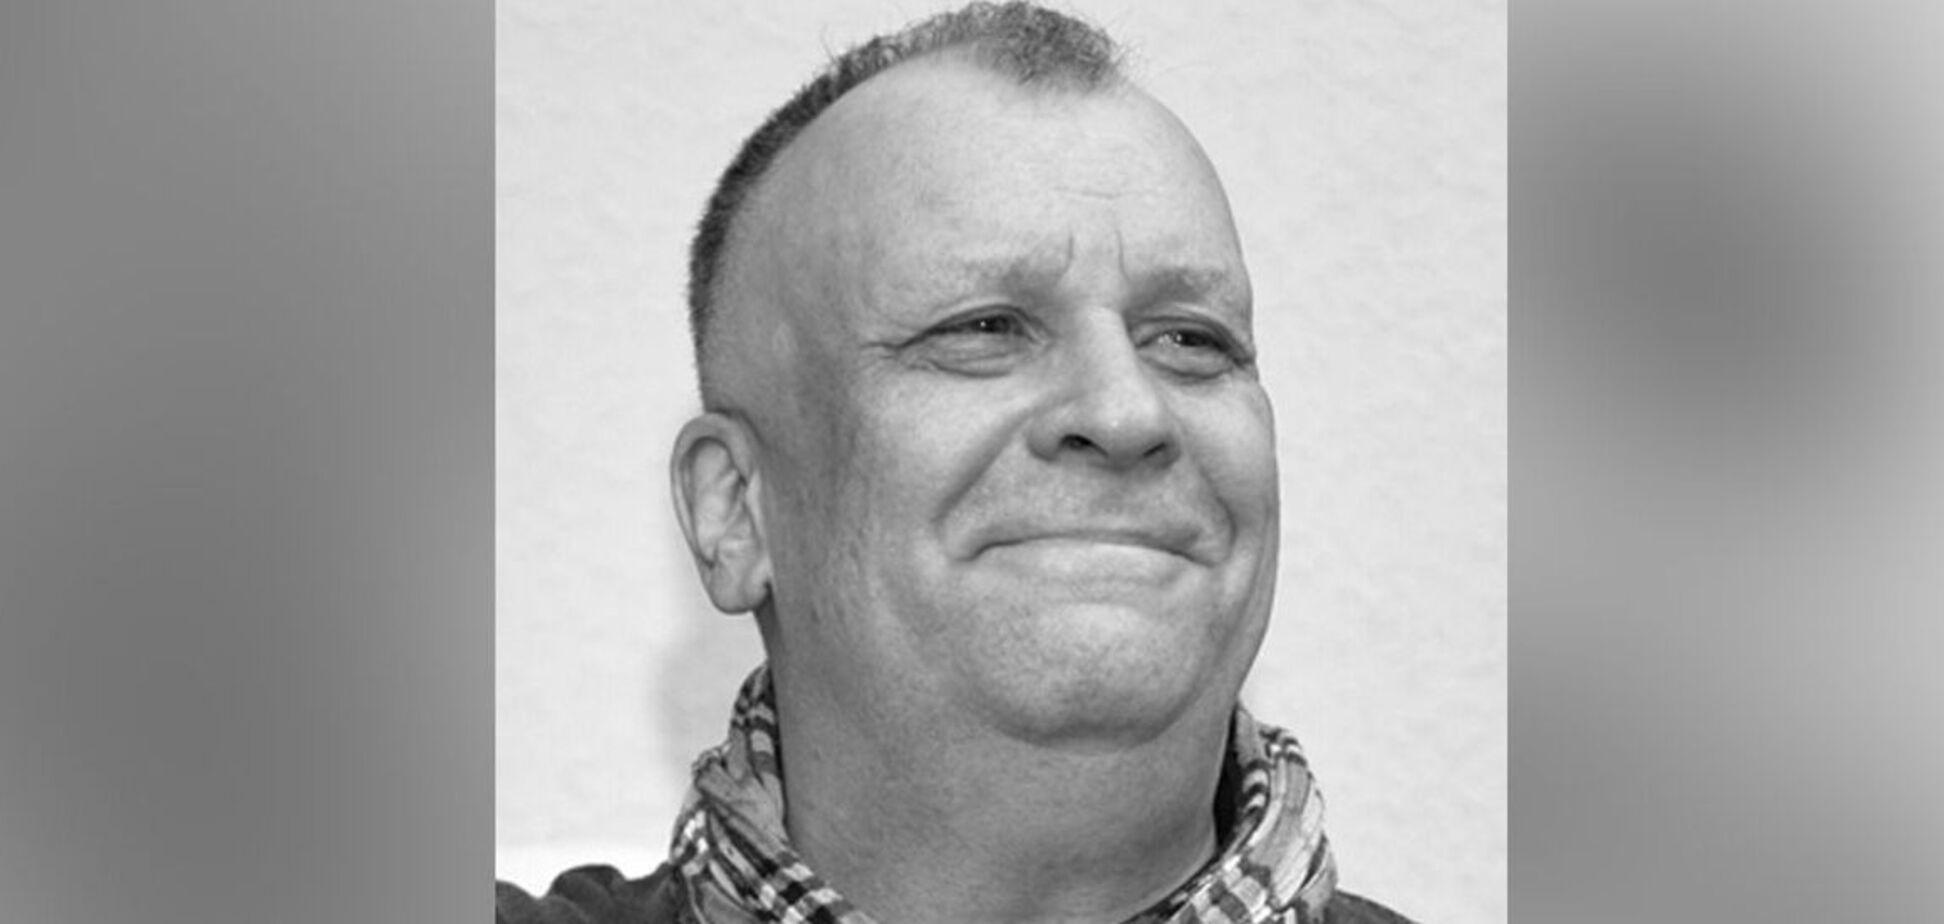 Олександр Дерев'янко зник 29 листопада